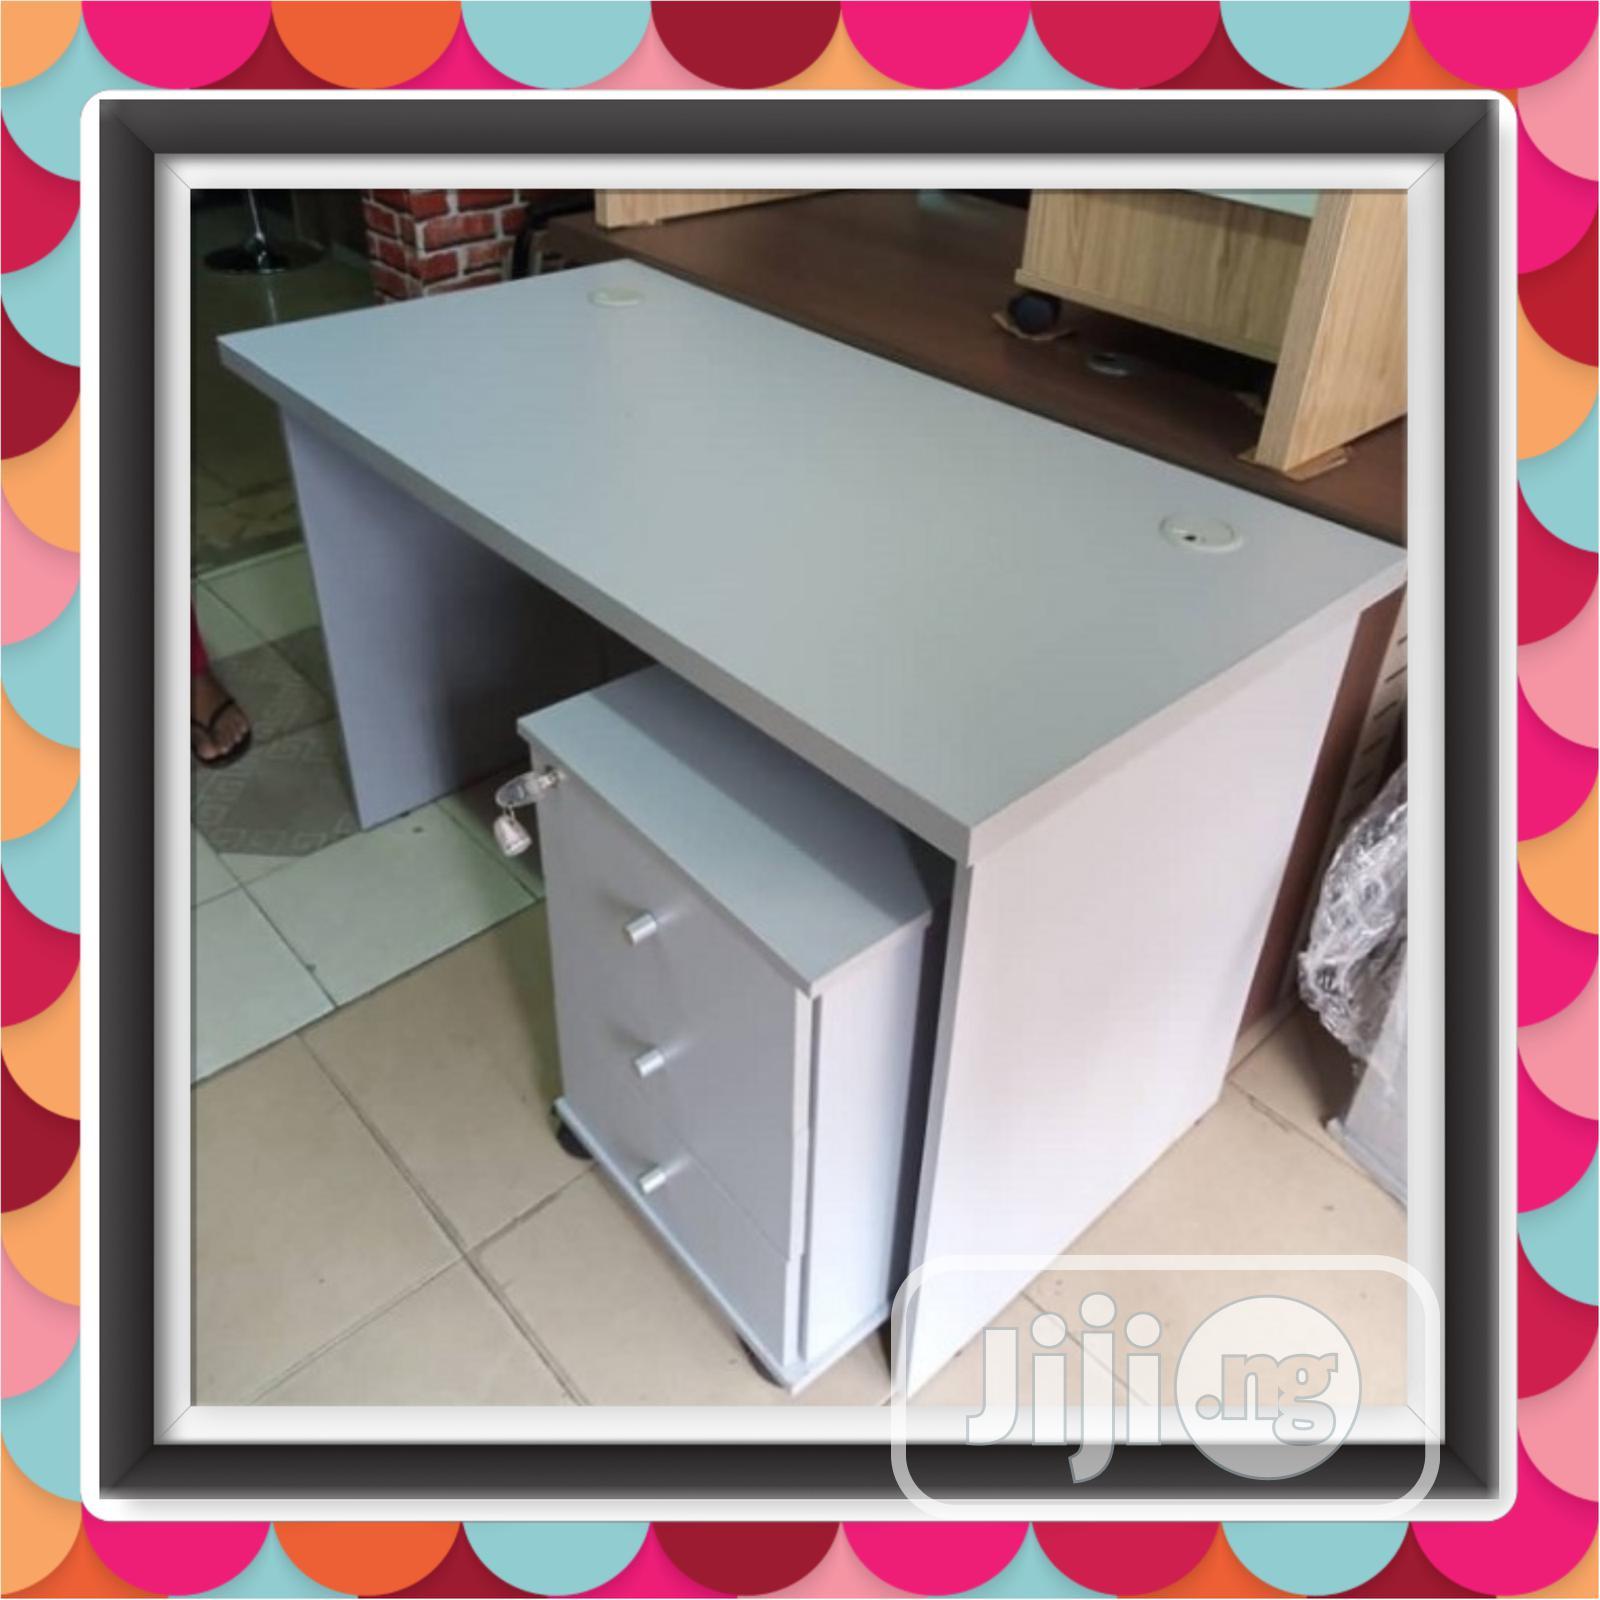 Executive Smart Design Office Table 120x60cm